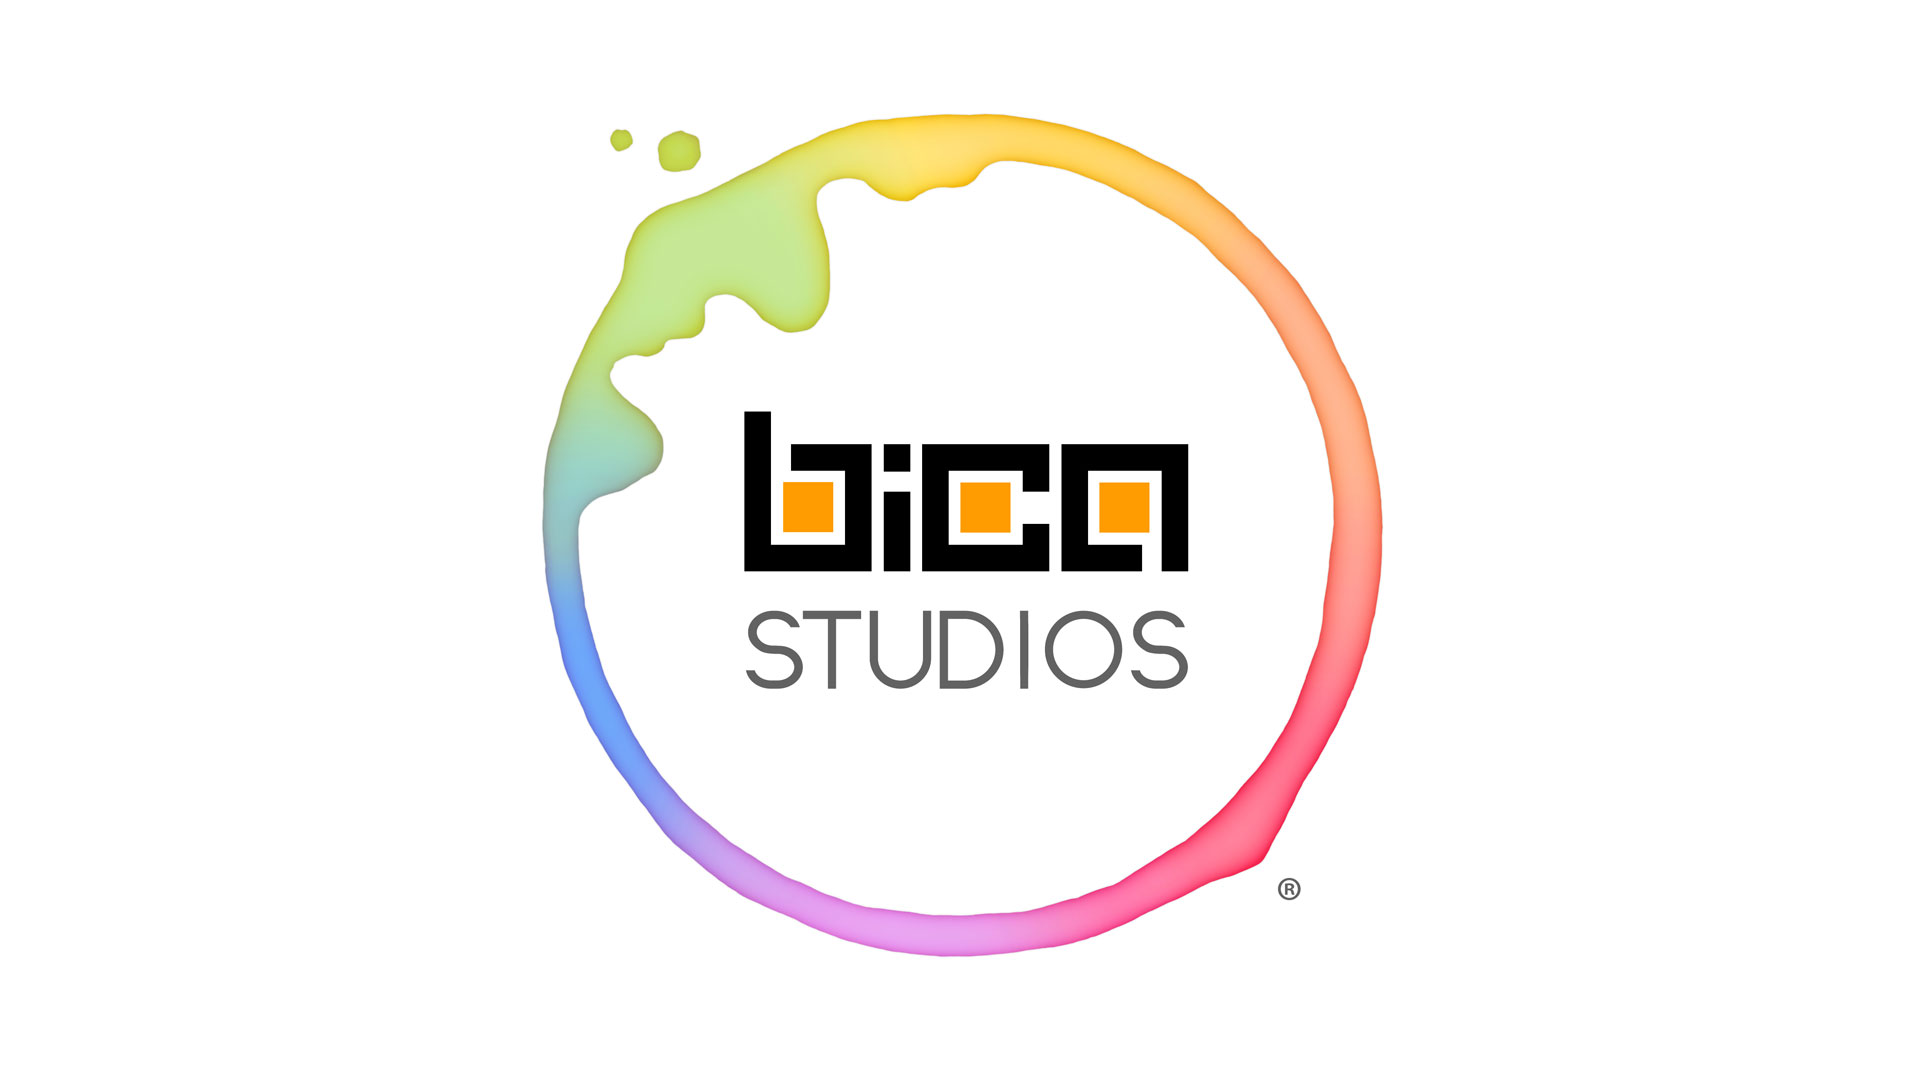 Bica Studios (logotipo)